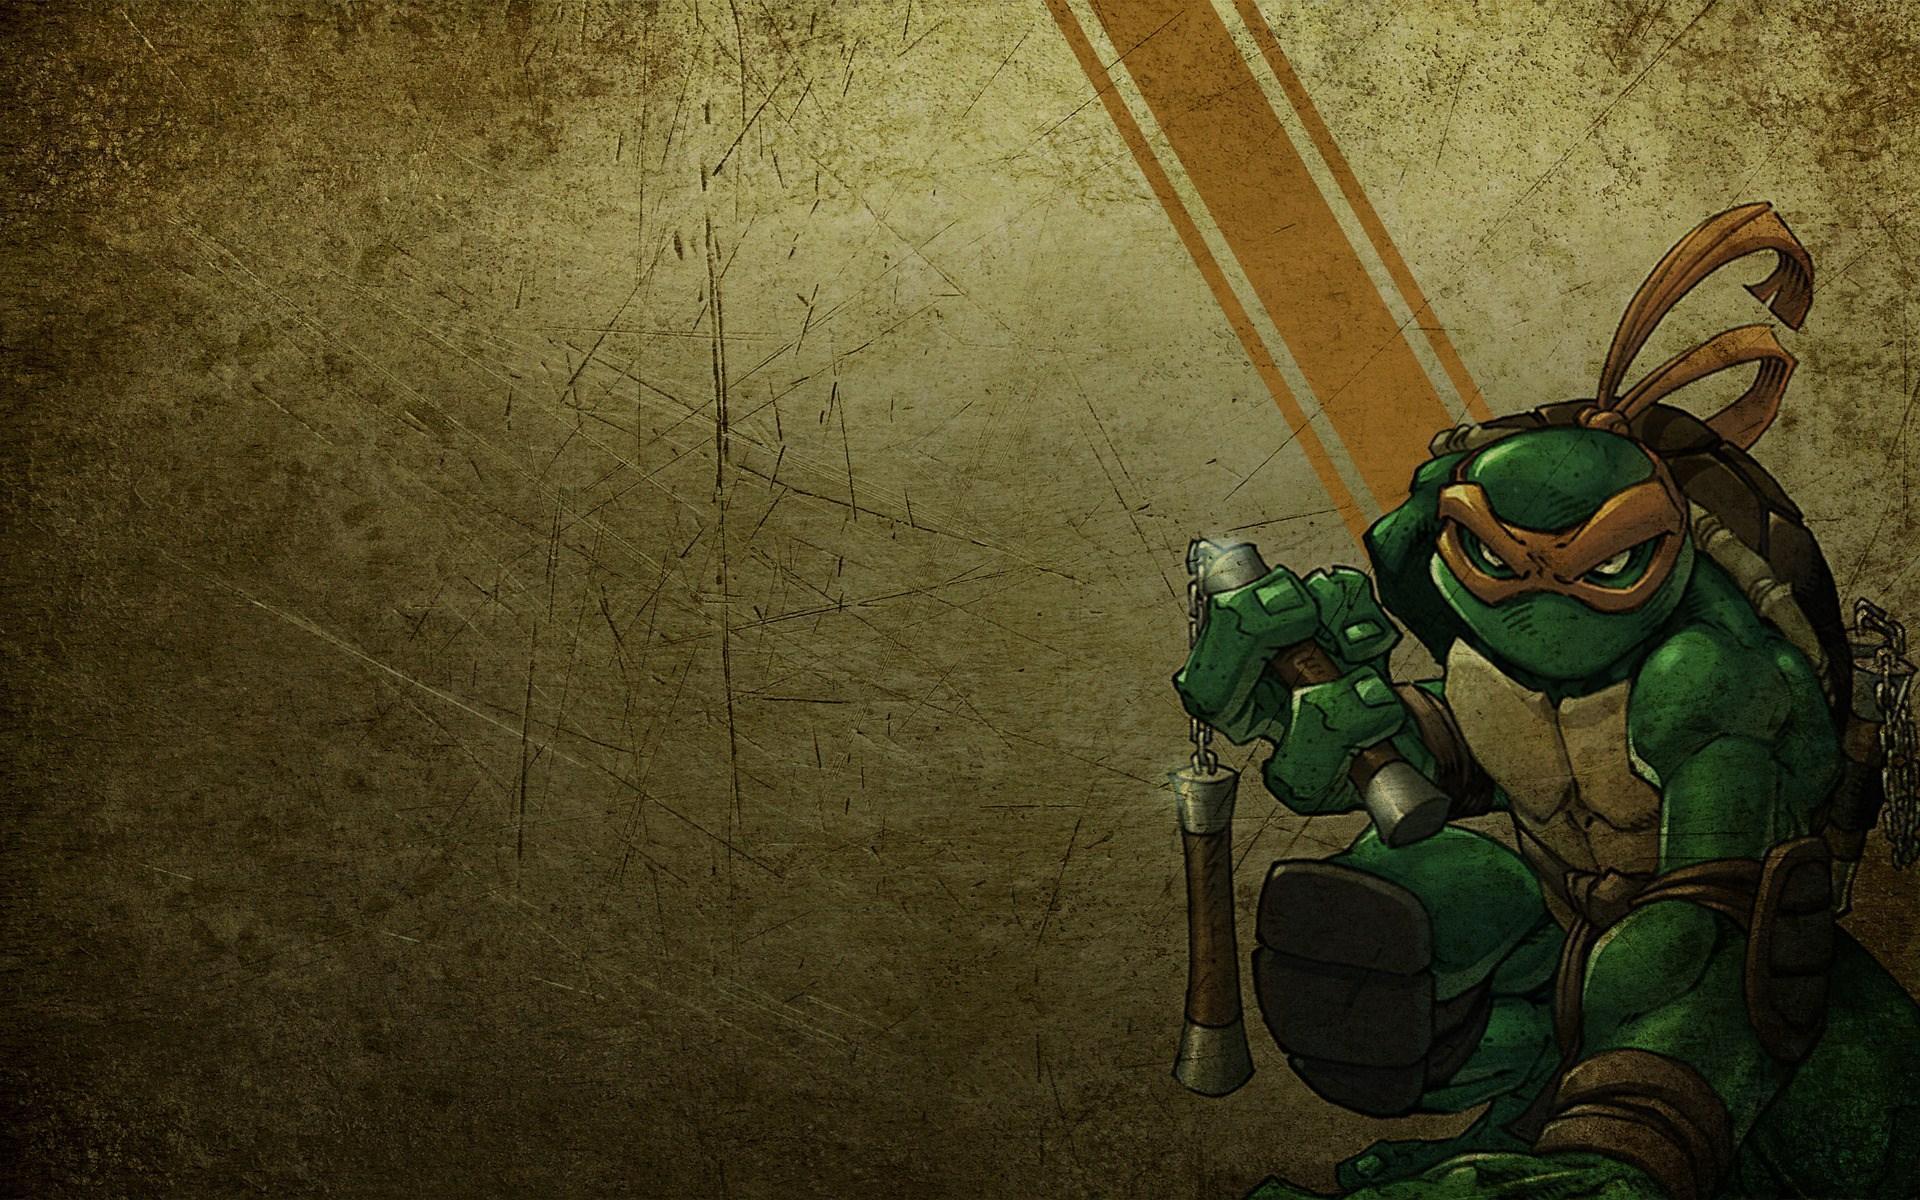 Kura-kura Ninja Michelangelo Mike Animasi Kartun - HD Wallpaper